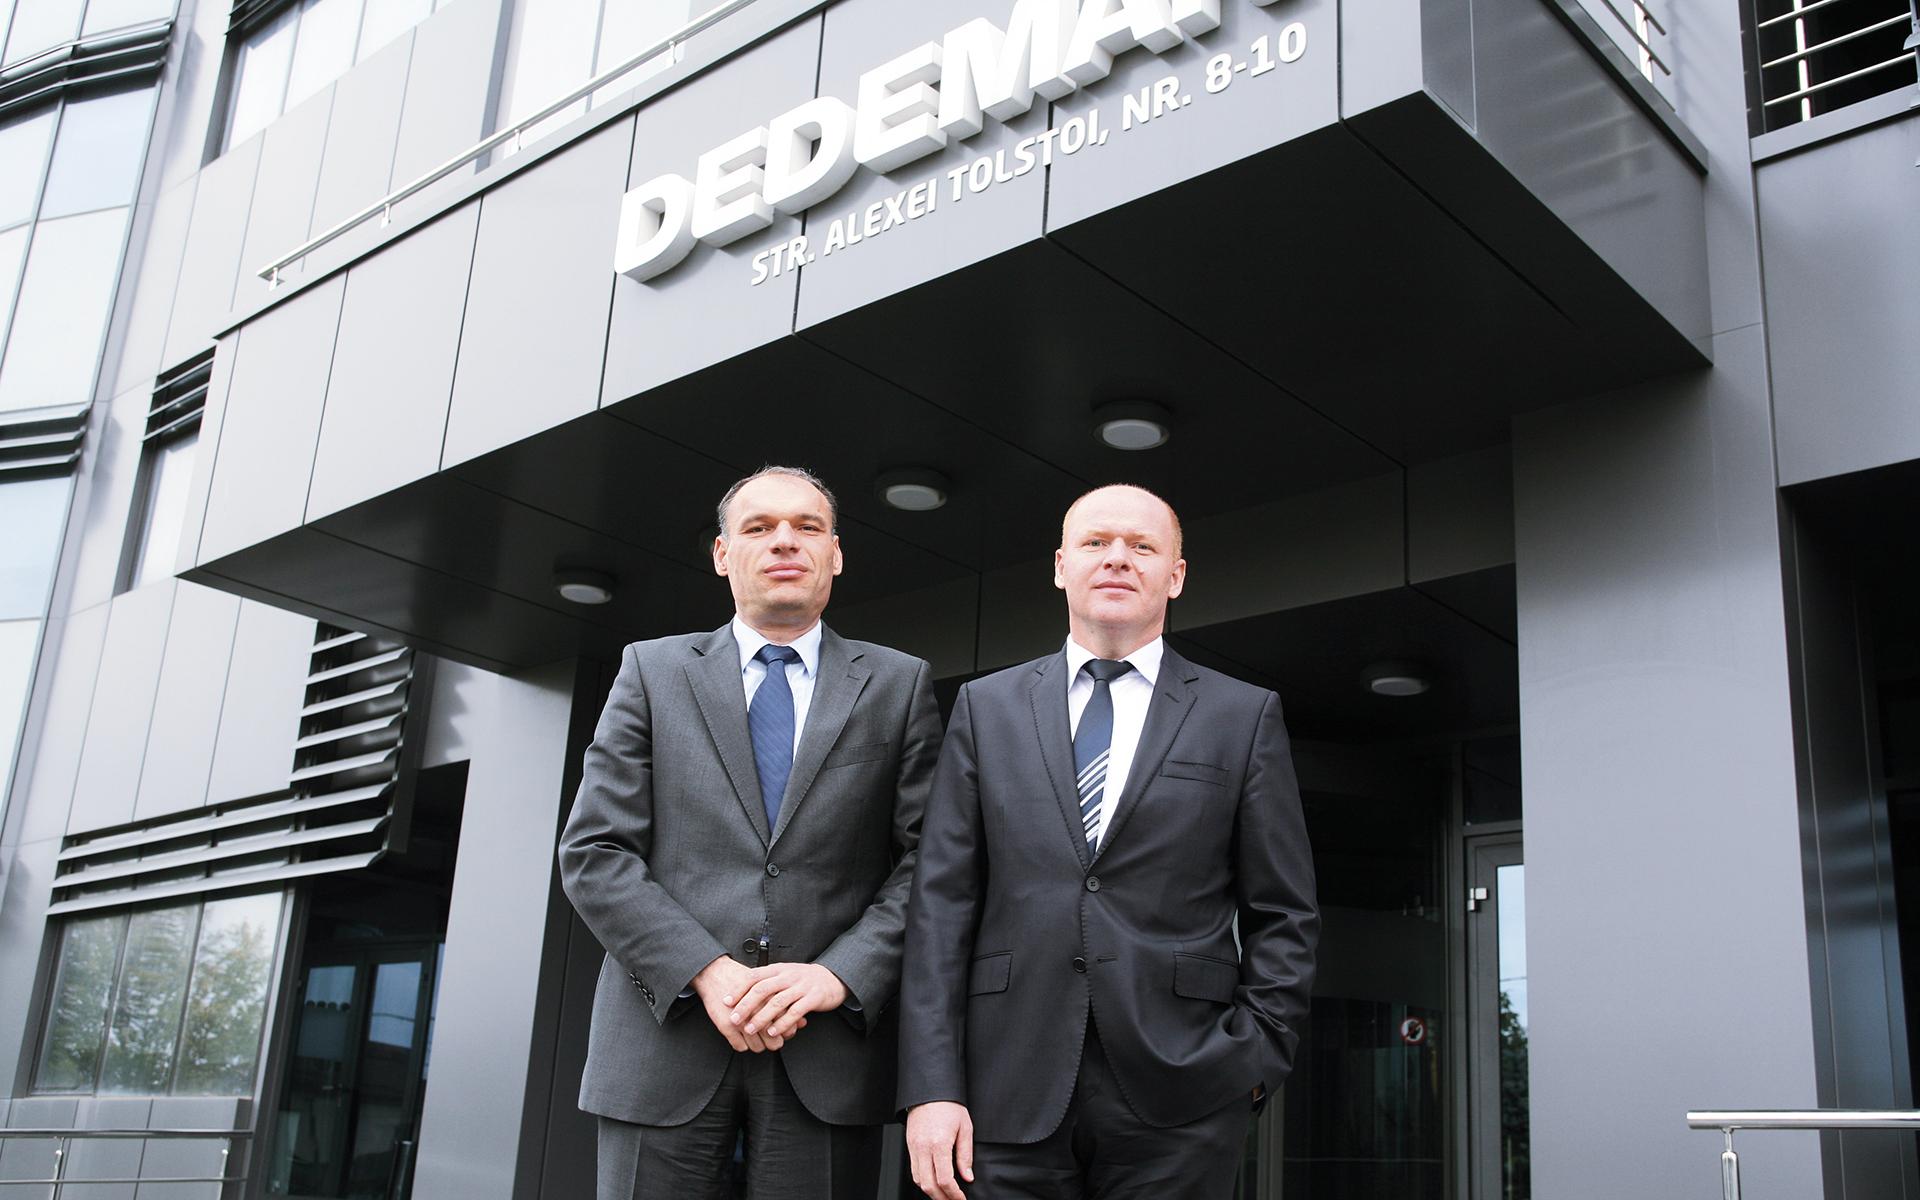 Top Antreprenori - Fratii Paval